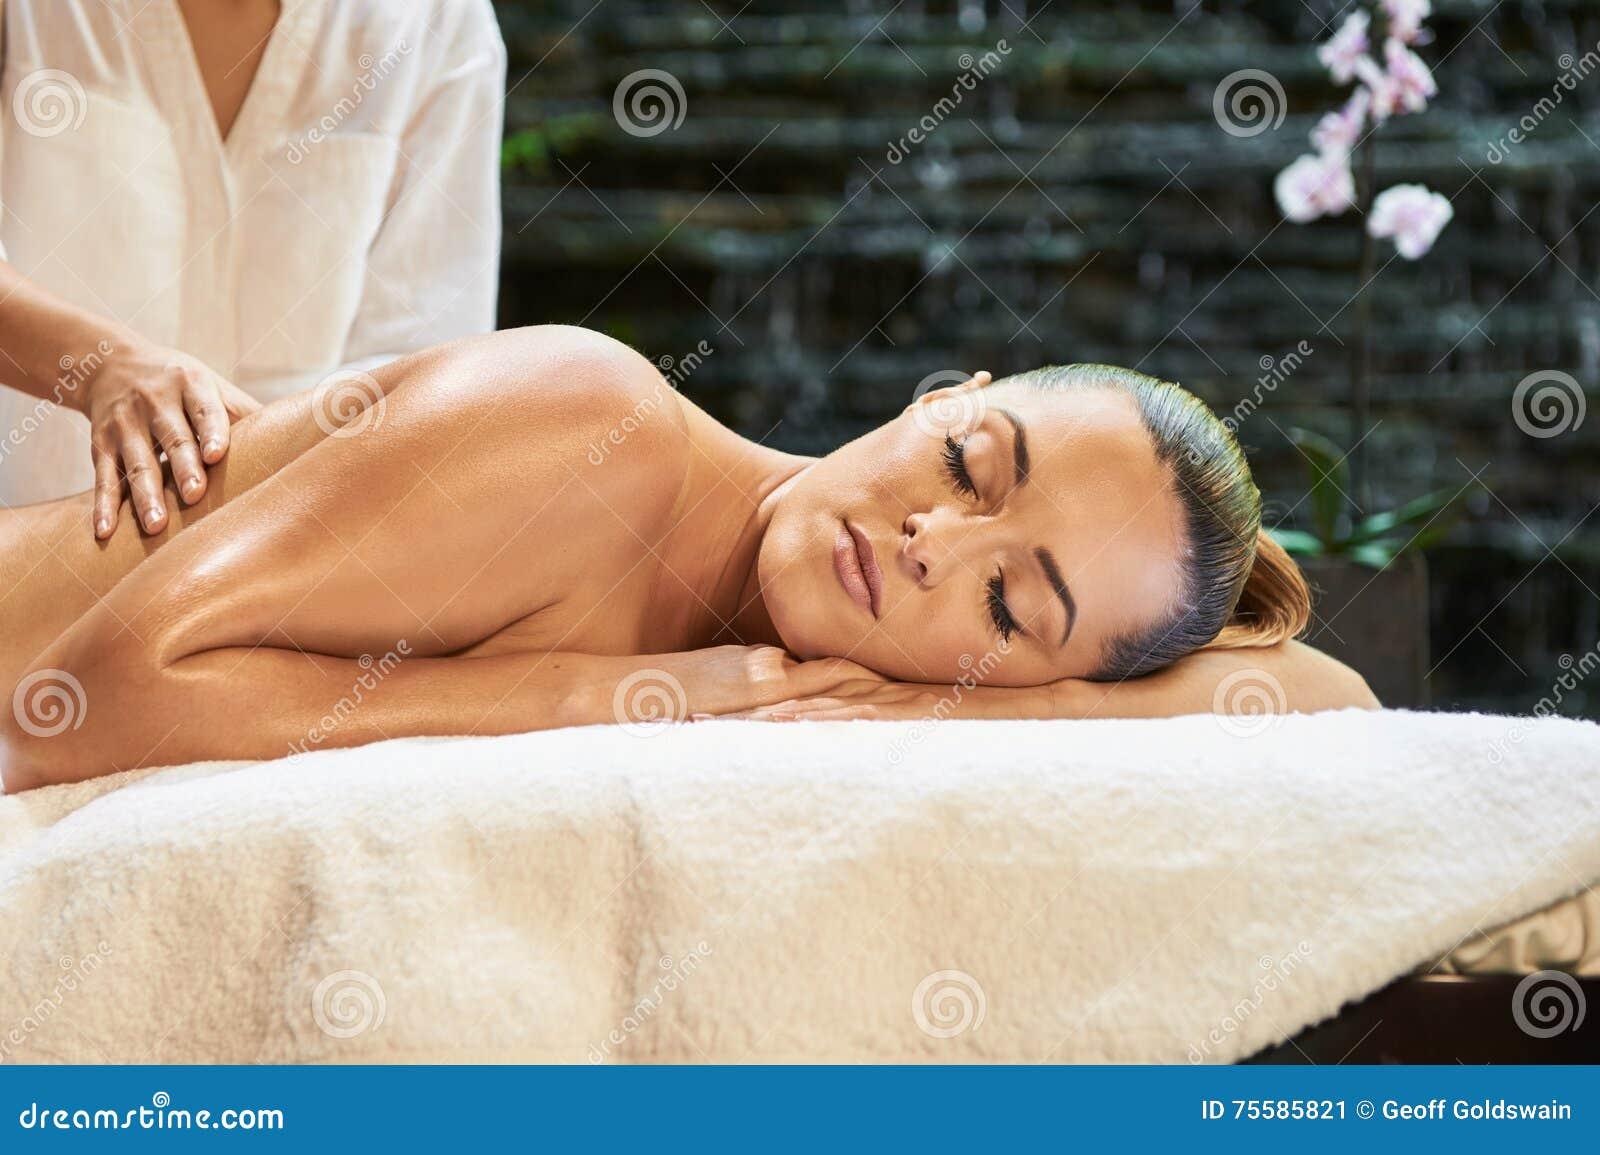 Asian Massage Stock Images - Download 16,616 Photos